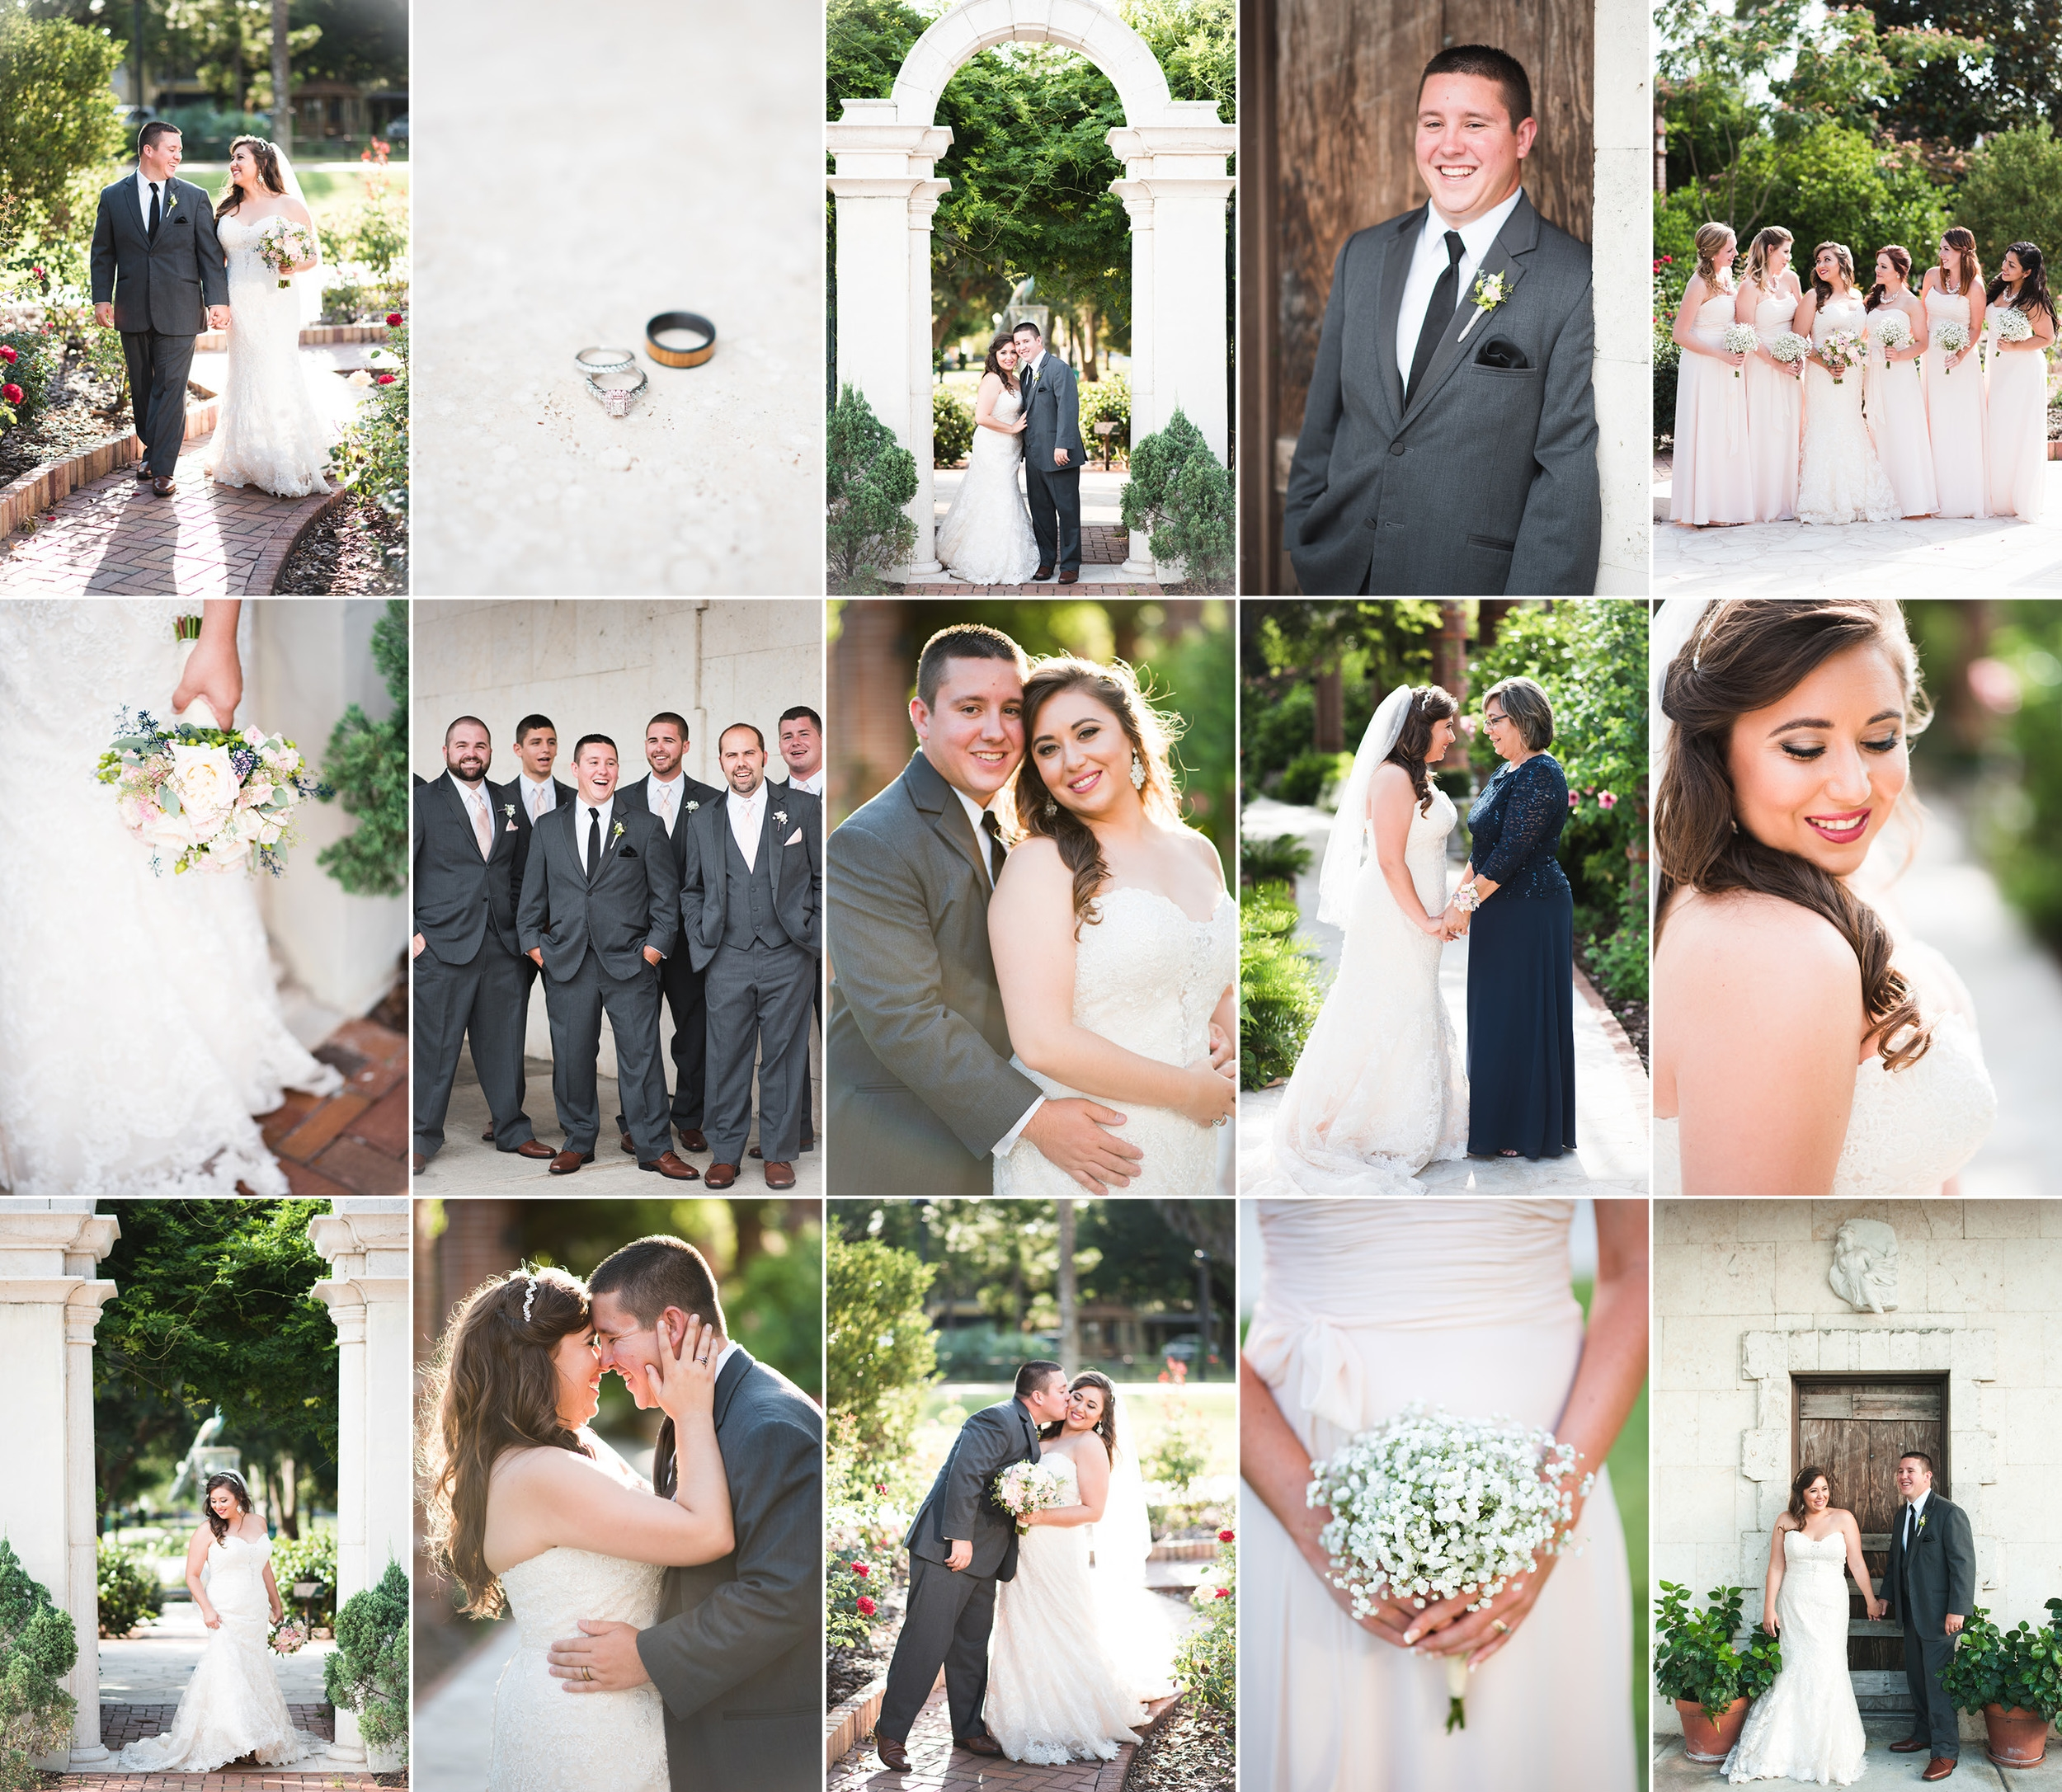 Sam + Cody - Winter Park, FL Wedding Photography with Caroline Maxcy Photography